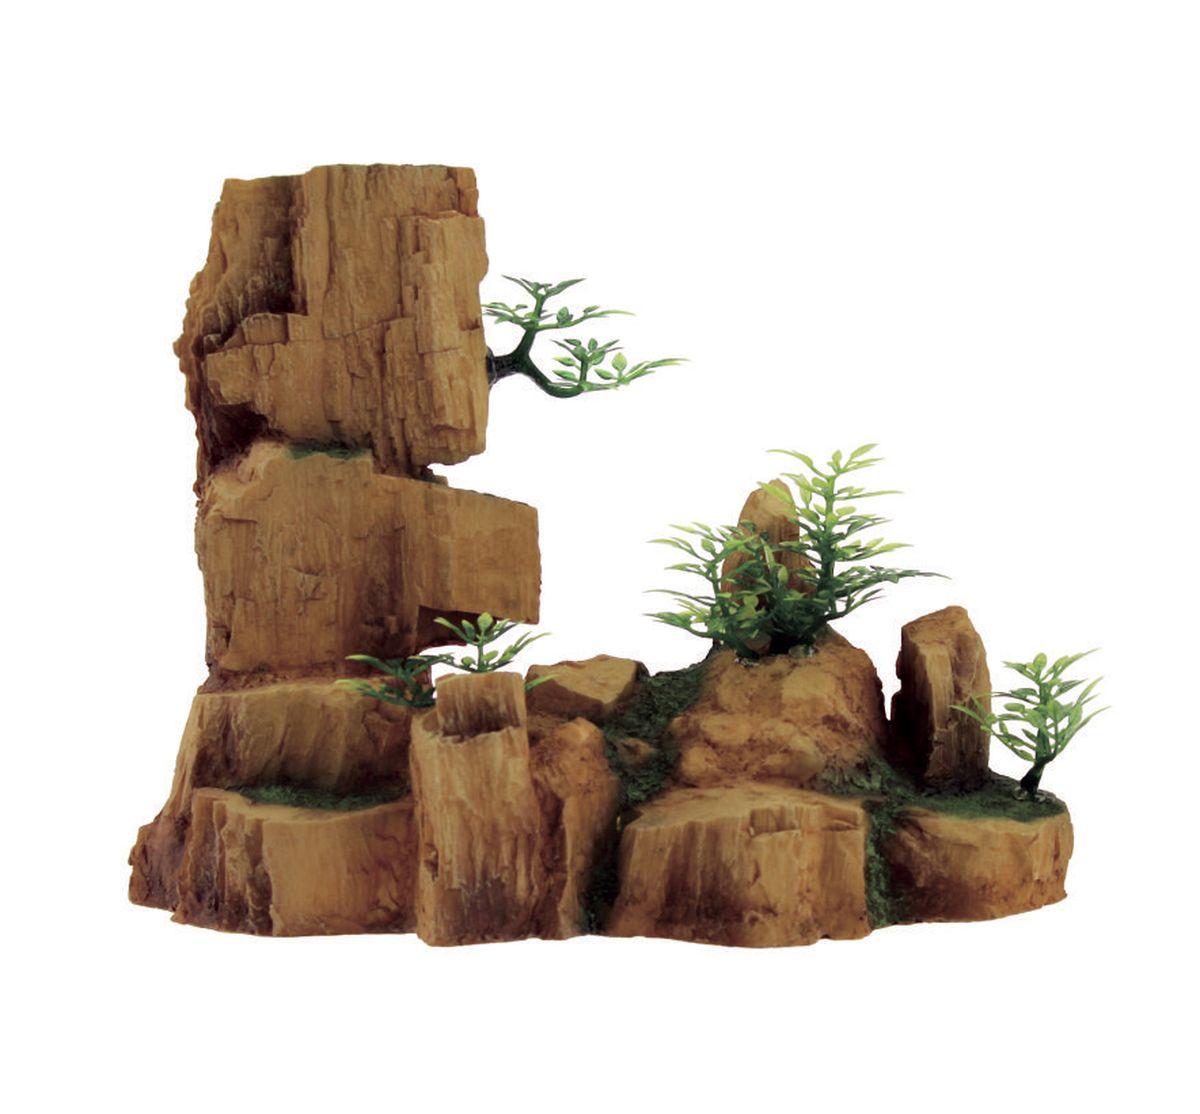 Декорация для аквариума ArtUniq Древние скалы, 24,5 x 11,5 x 19,1 смART-3116270Декорация для аквариума ArtUniq Древние скалы, 24,5 x 11,5 x 19,1 см